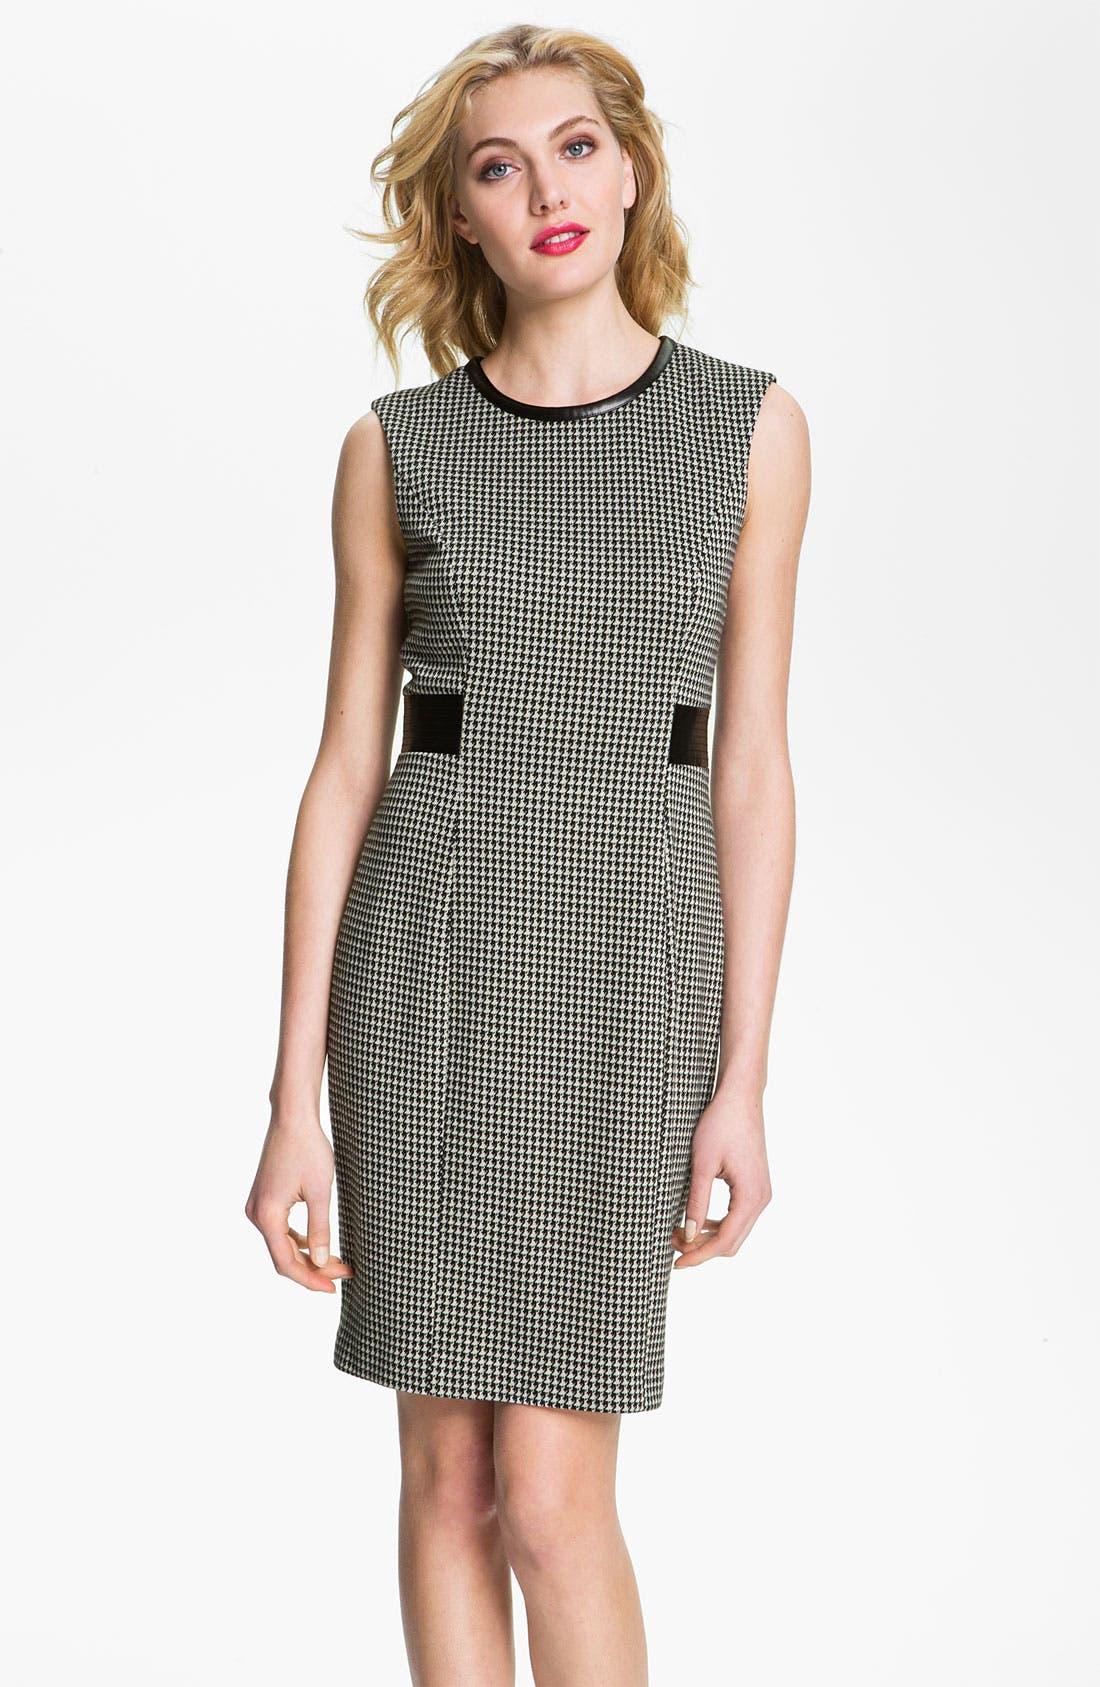 Alternate Image 1 Selected - Calvin Klein Sleeveless Houndstooth Sheath Dress